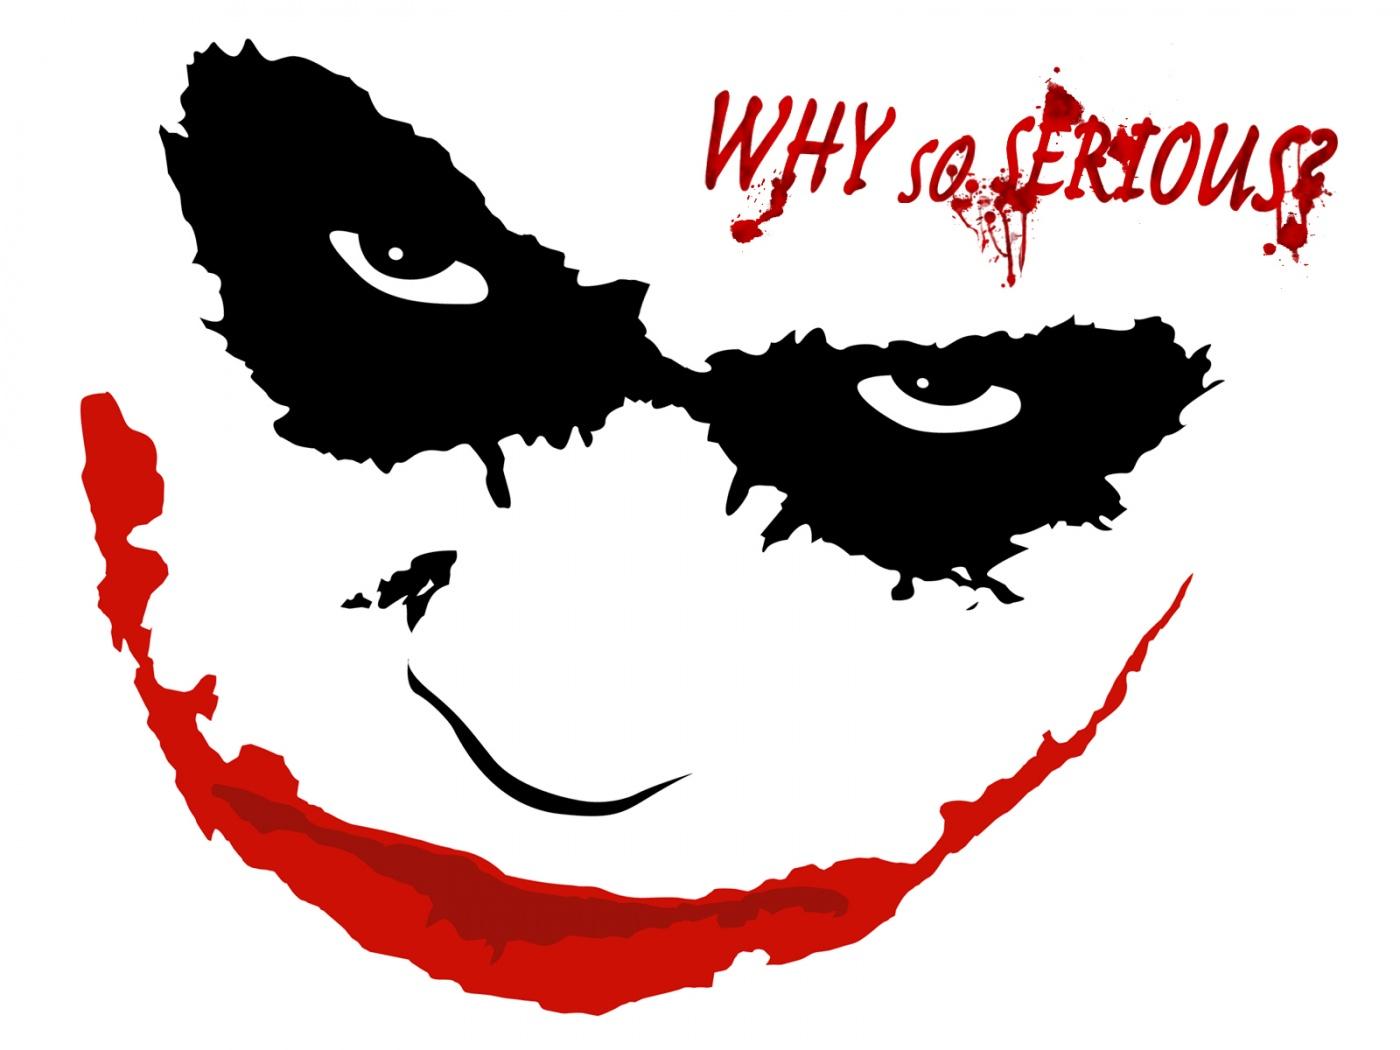 Why So Serious Joker Face Logo Free Image